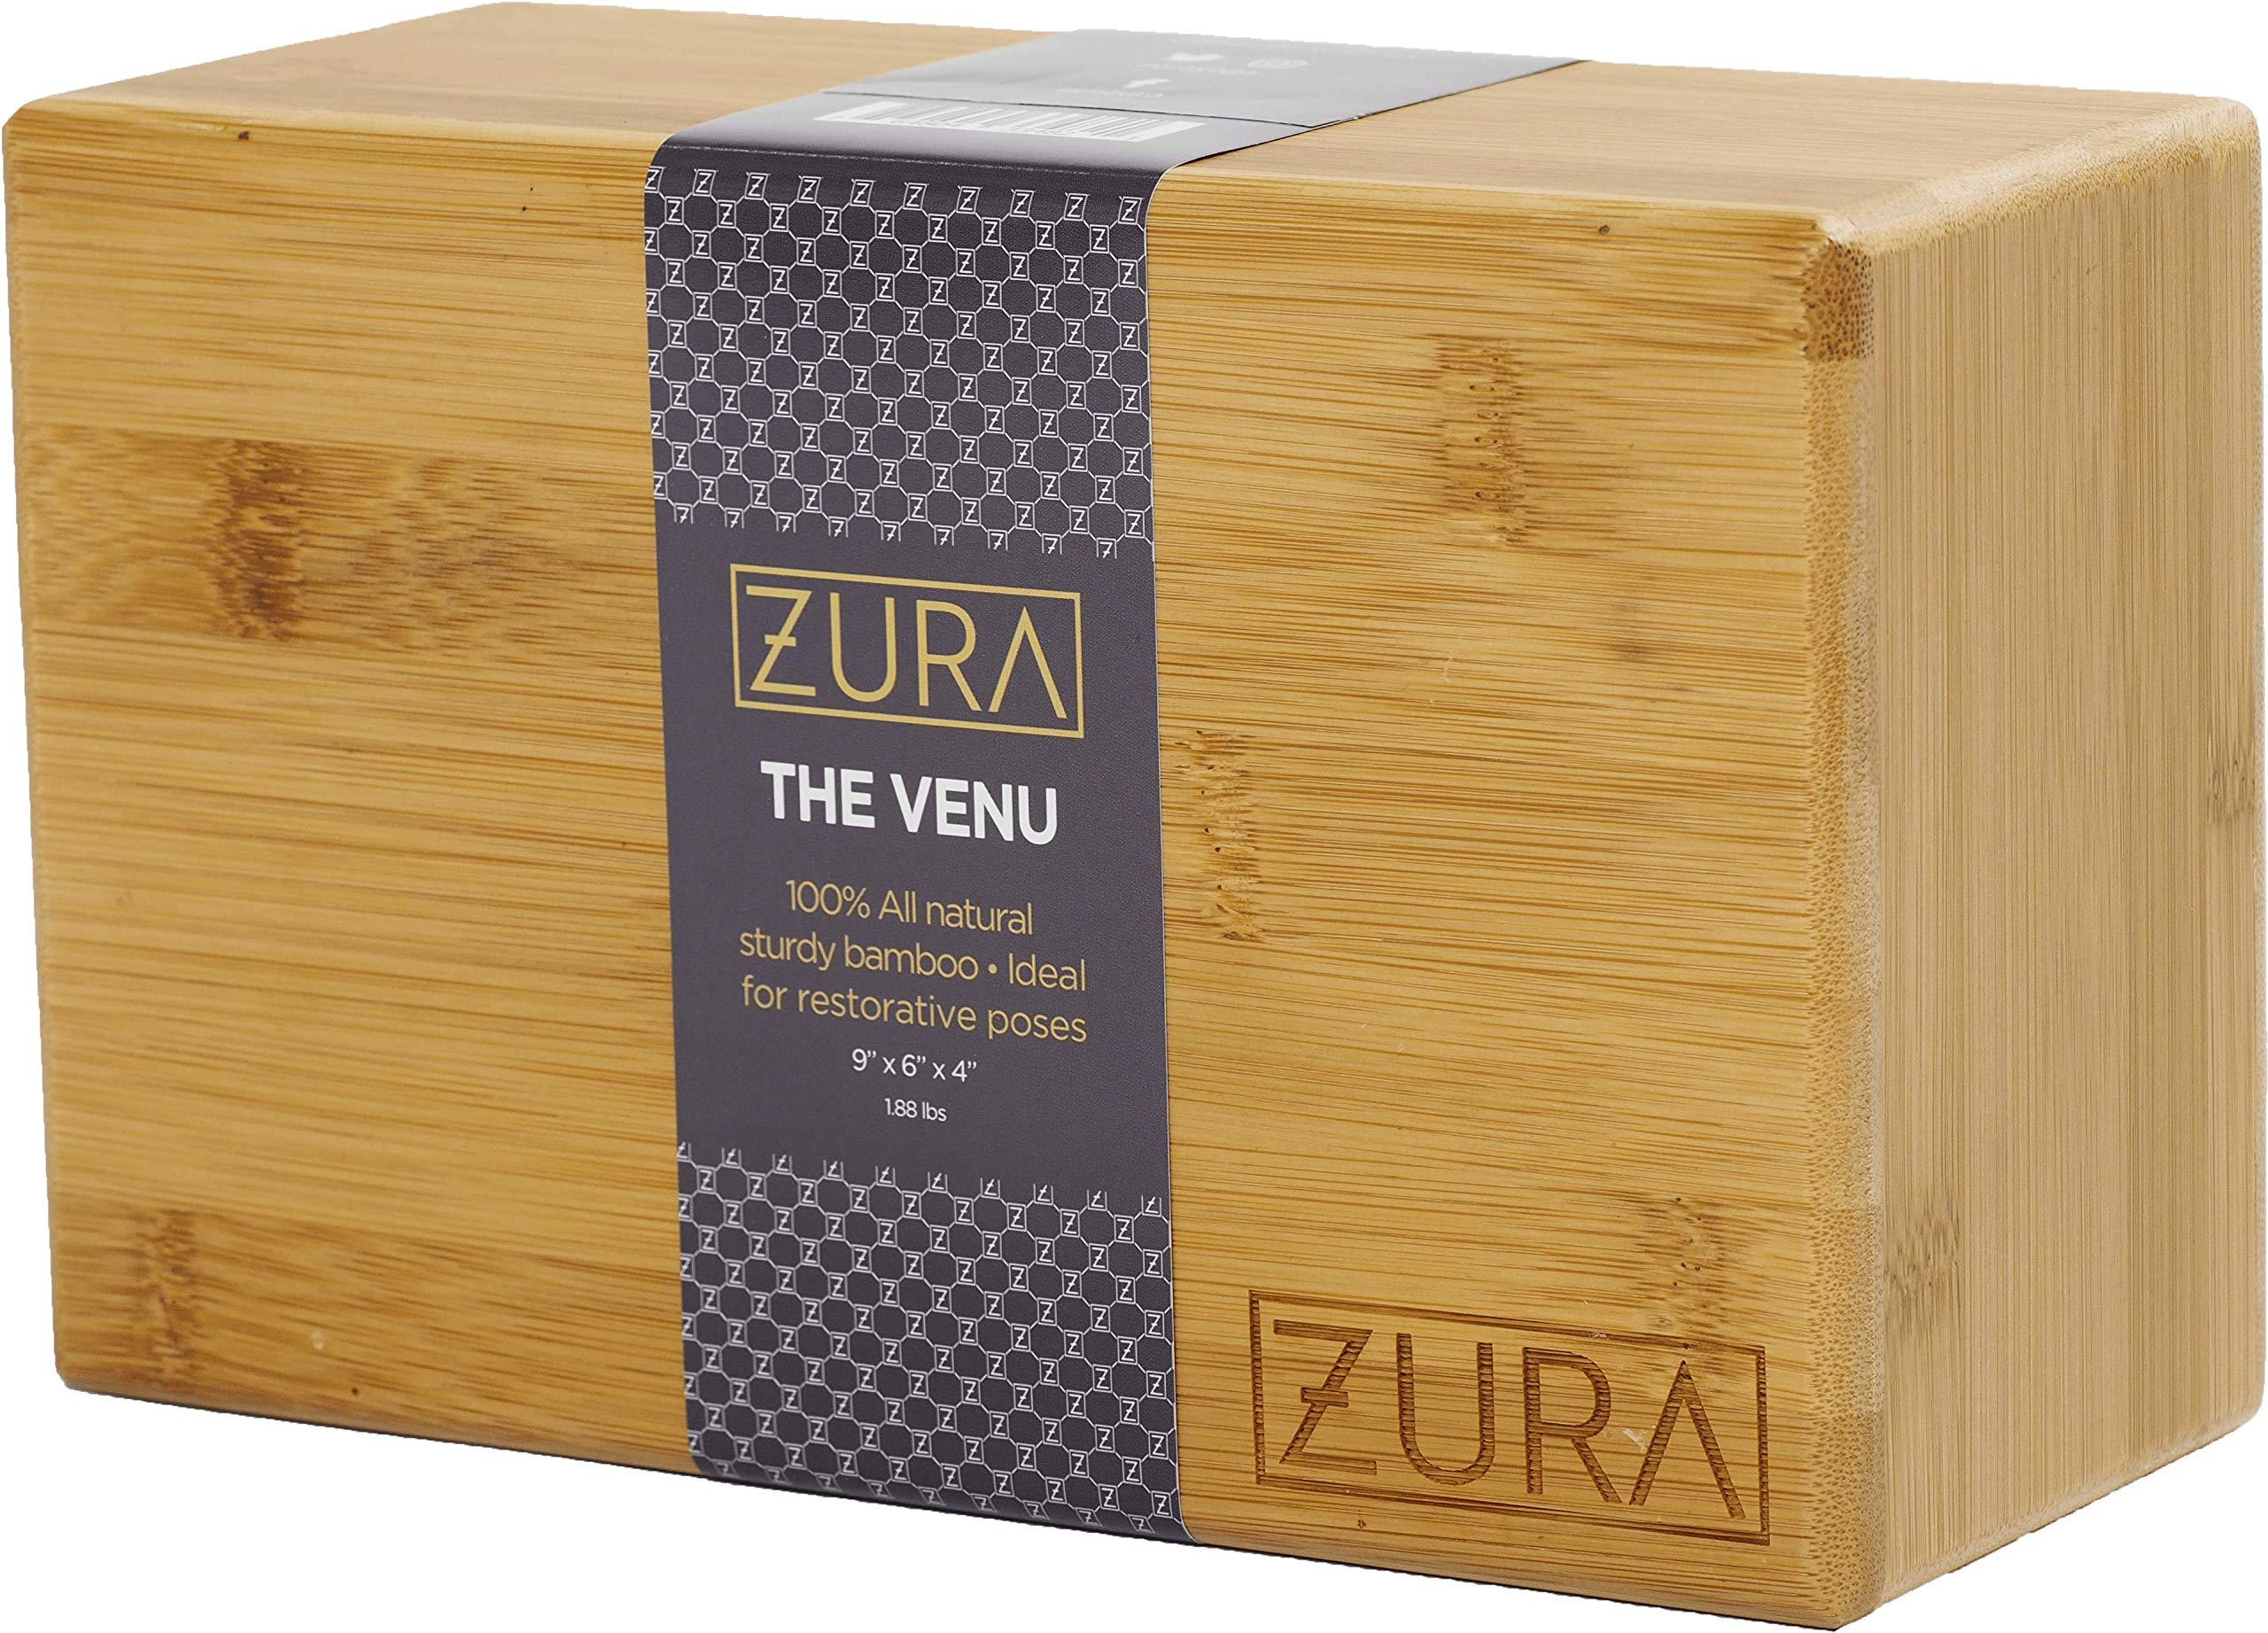 ZURA Premium Yoga Block (Bamboo Yoga Block)